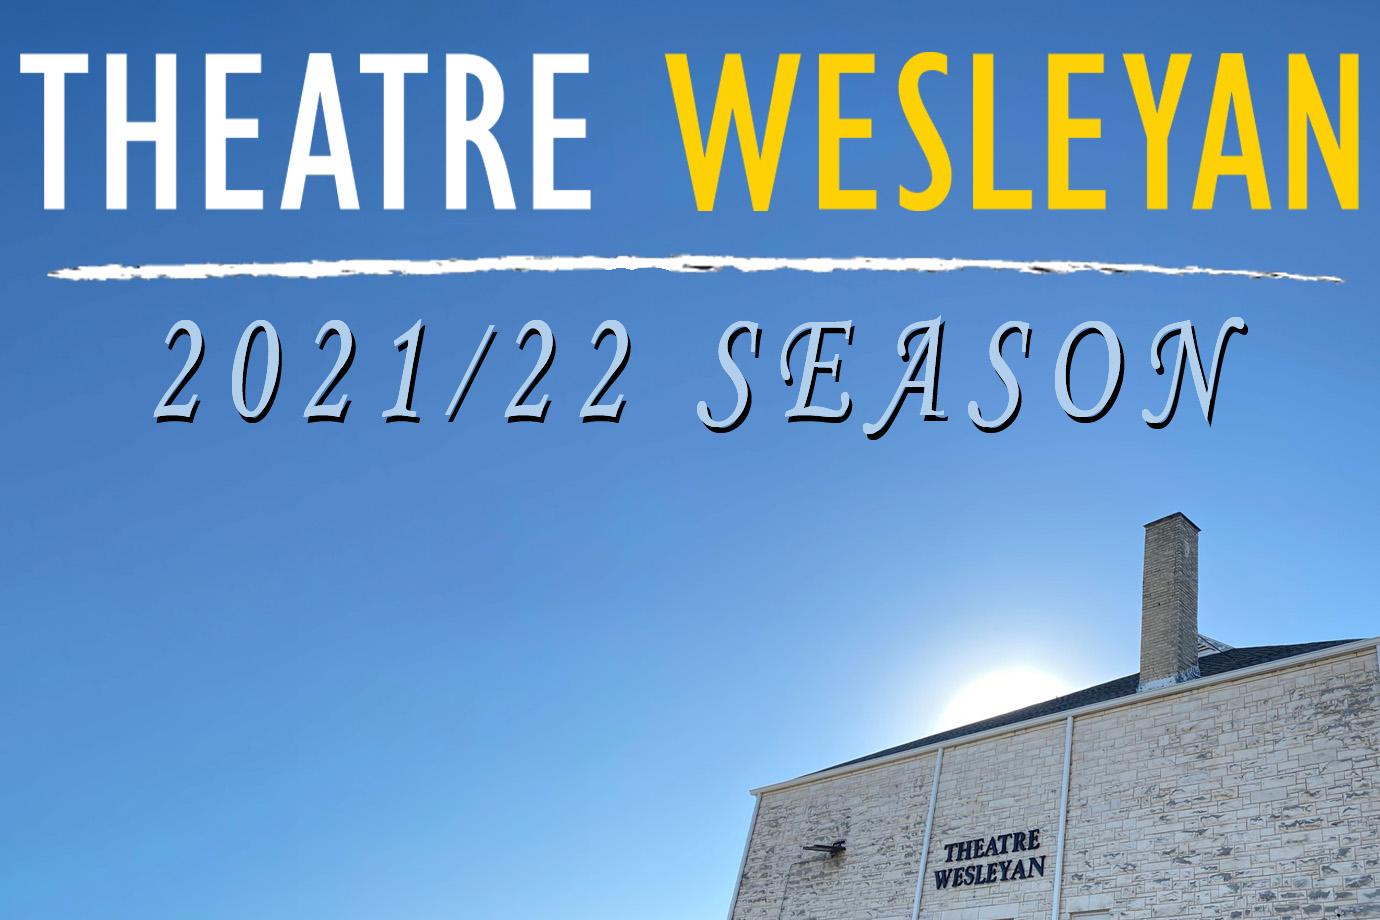 Theatre Wesleyan Box Office